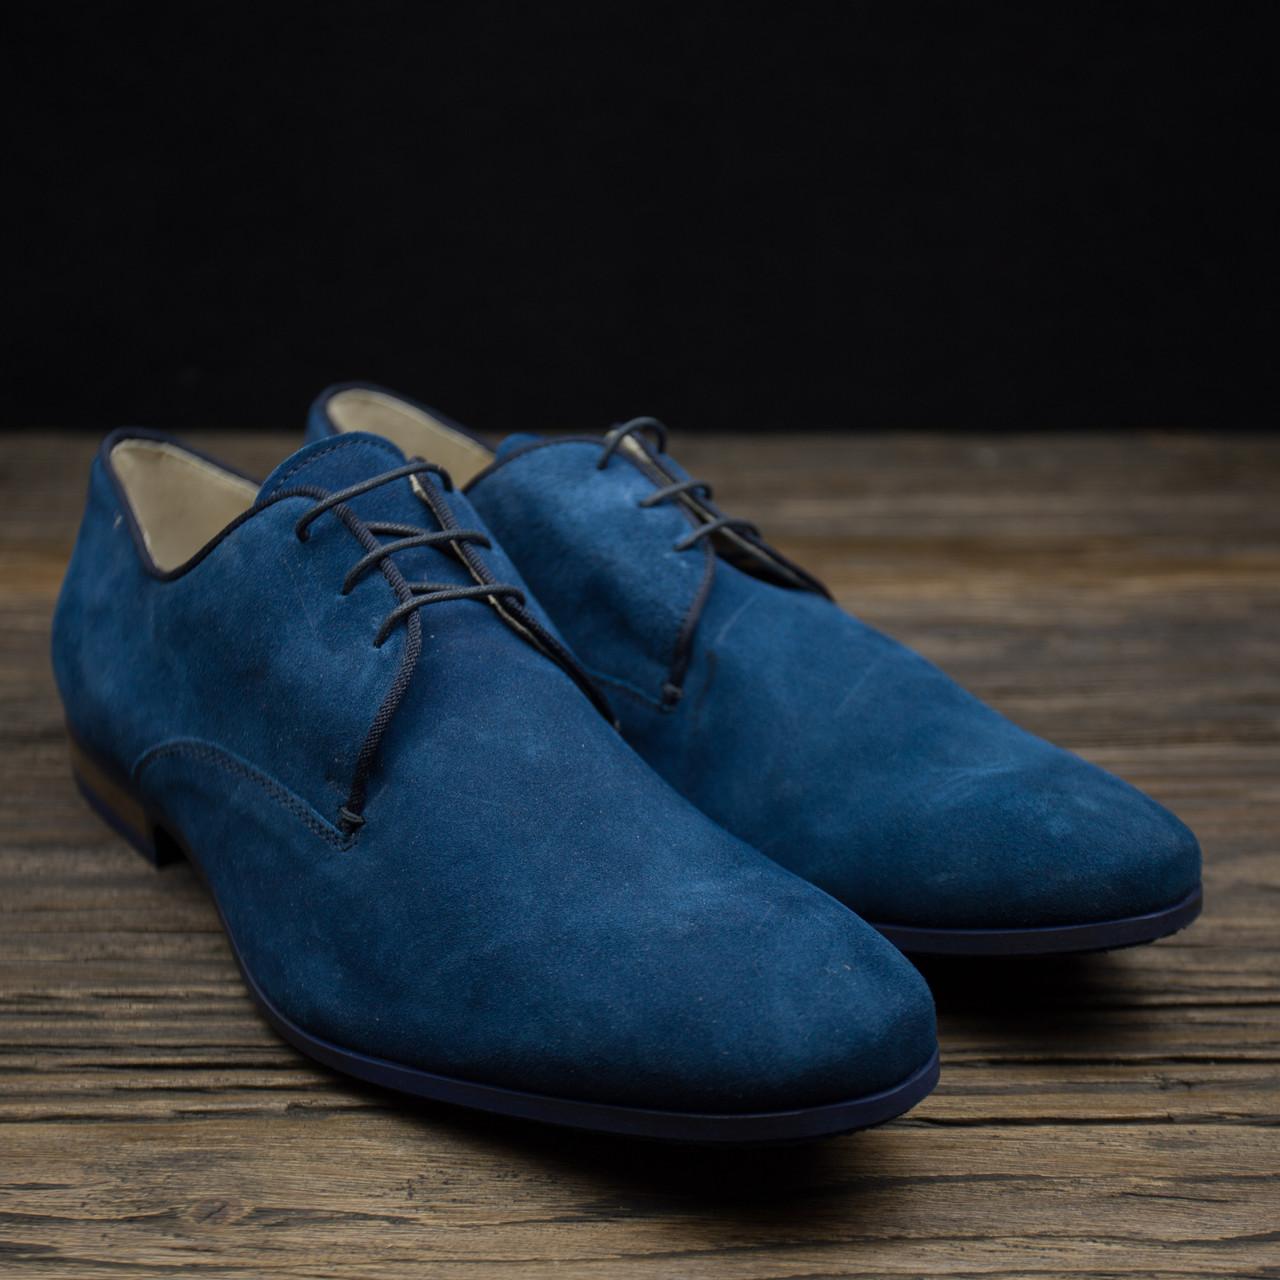 Мужские туфли натуральная замша San Marina р-44, фото 1